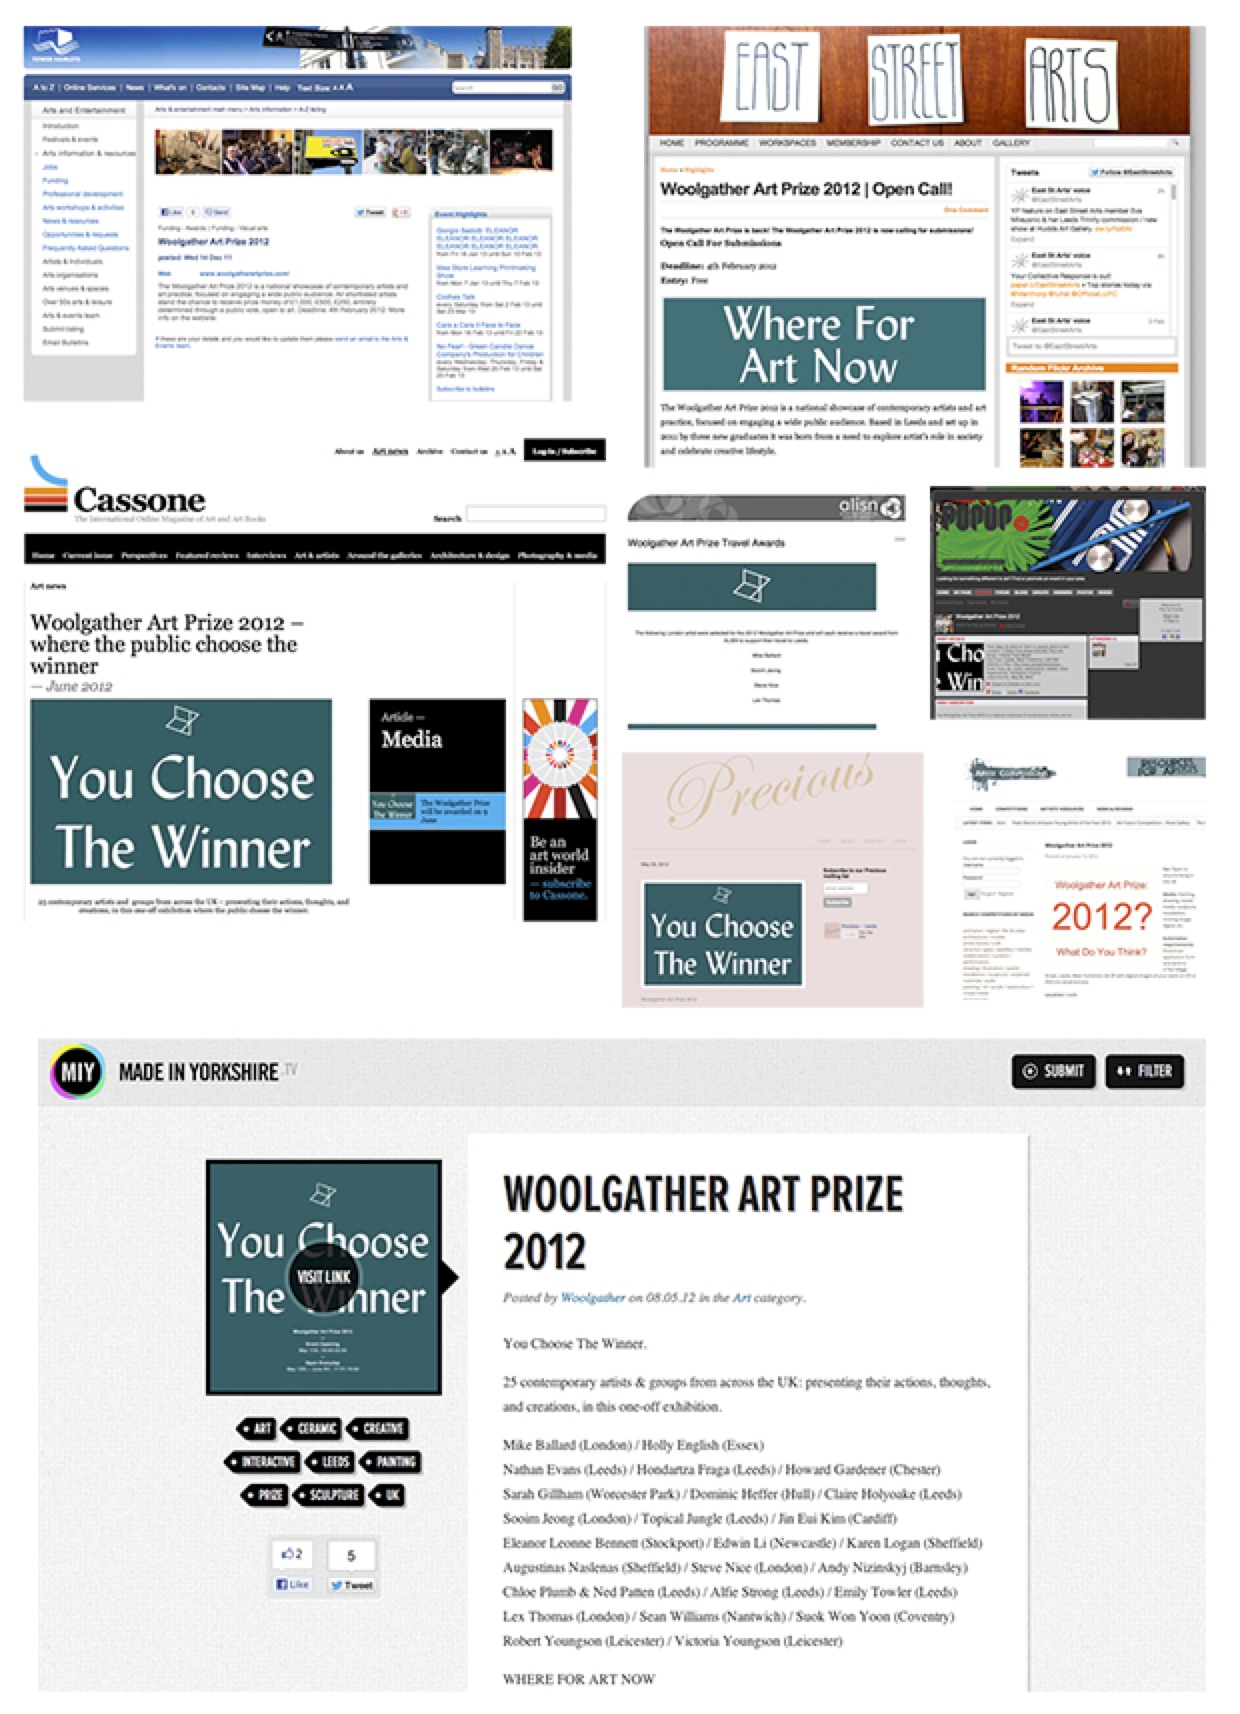 Woolgather Art Prize 2012